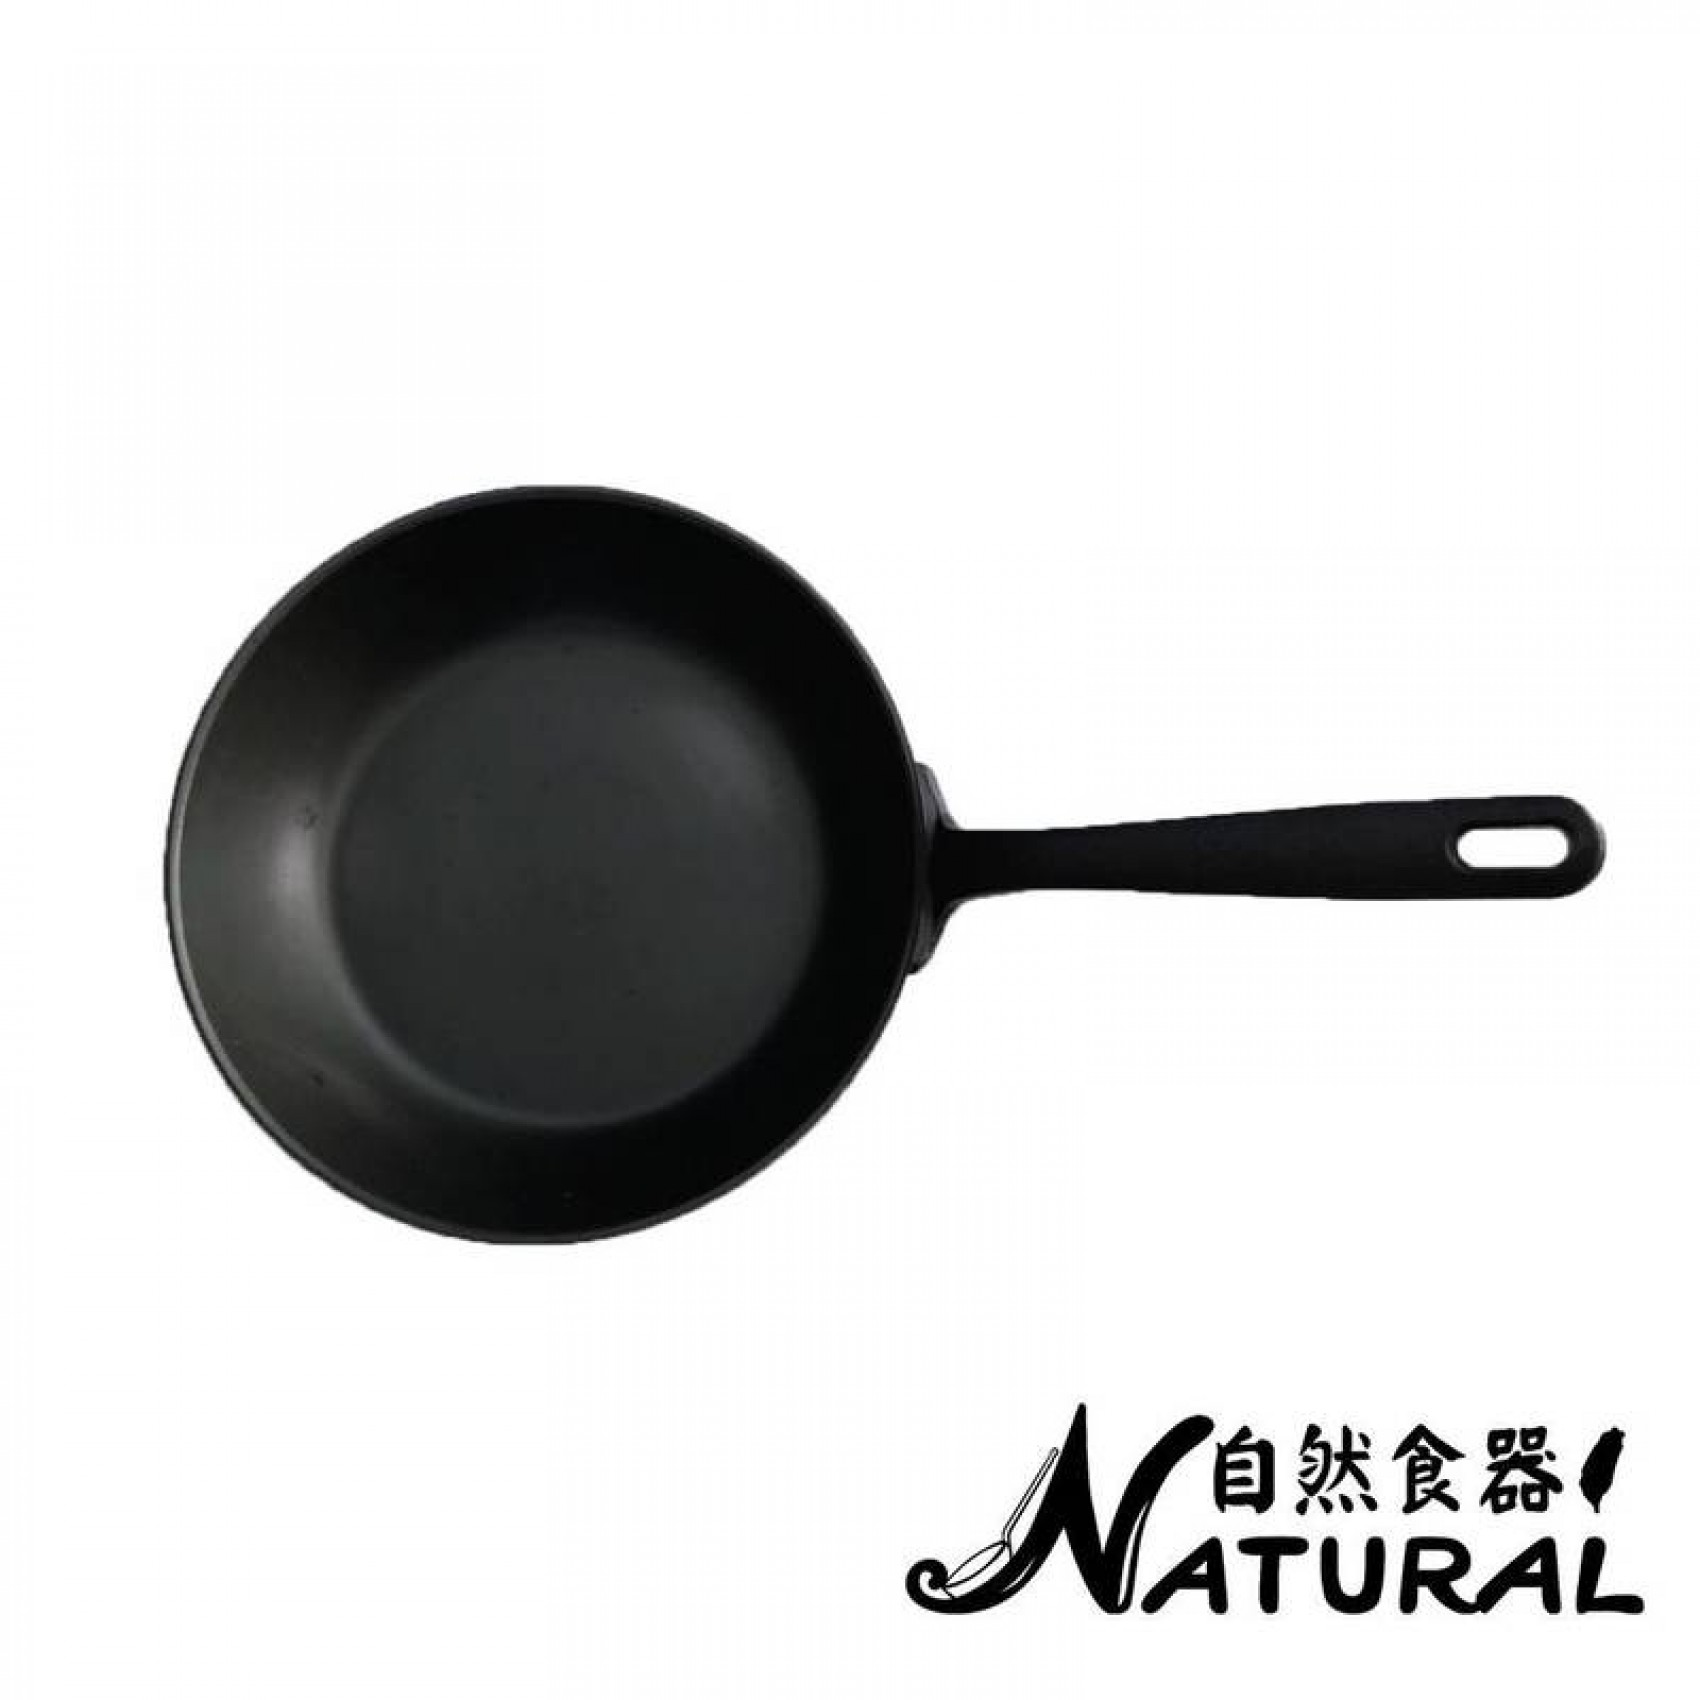 20cm平底鍋 20cm Fry Pan